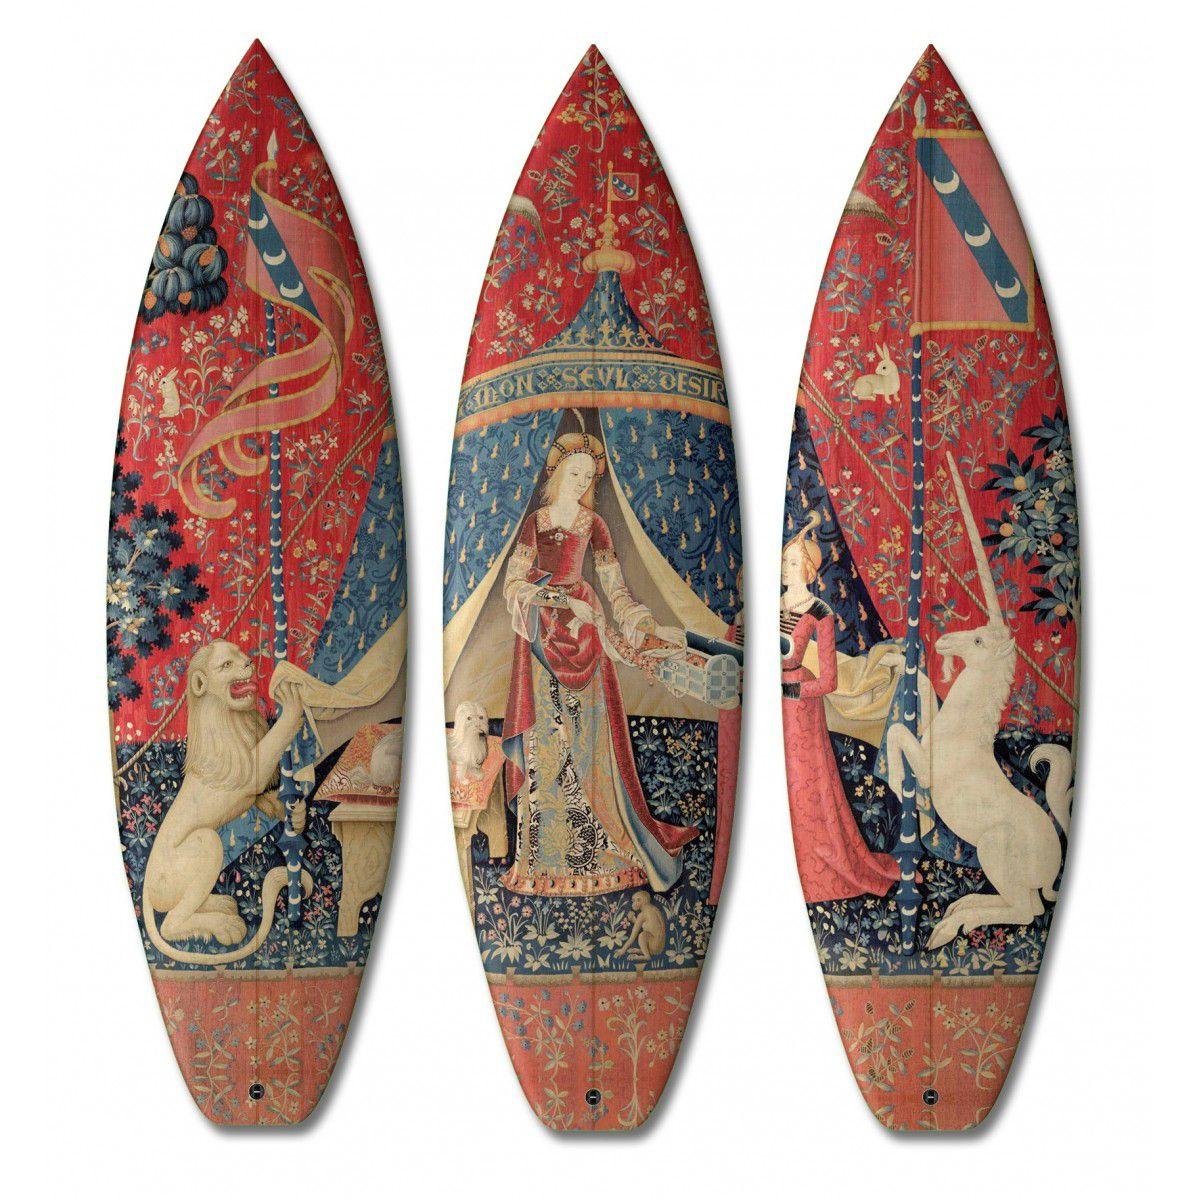 Boom Art Where Sporting Goods Meet Renaissance Art Shown Lady And The Unicorn Surfboards Con Imagenes Arte Clasico Arte De Tablas De Surf Arte Renacentista